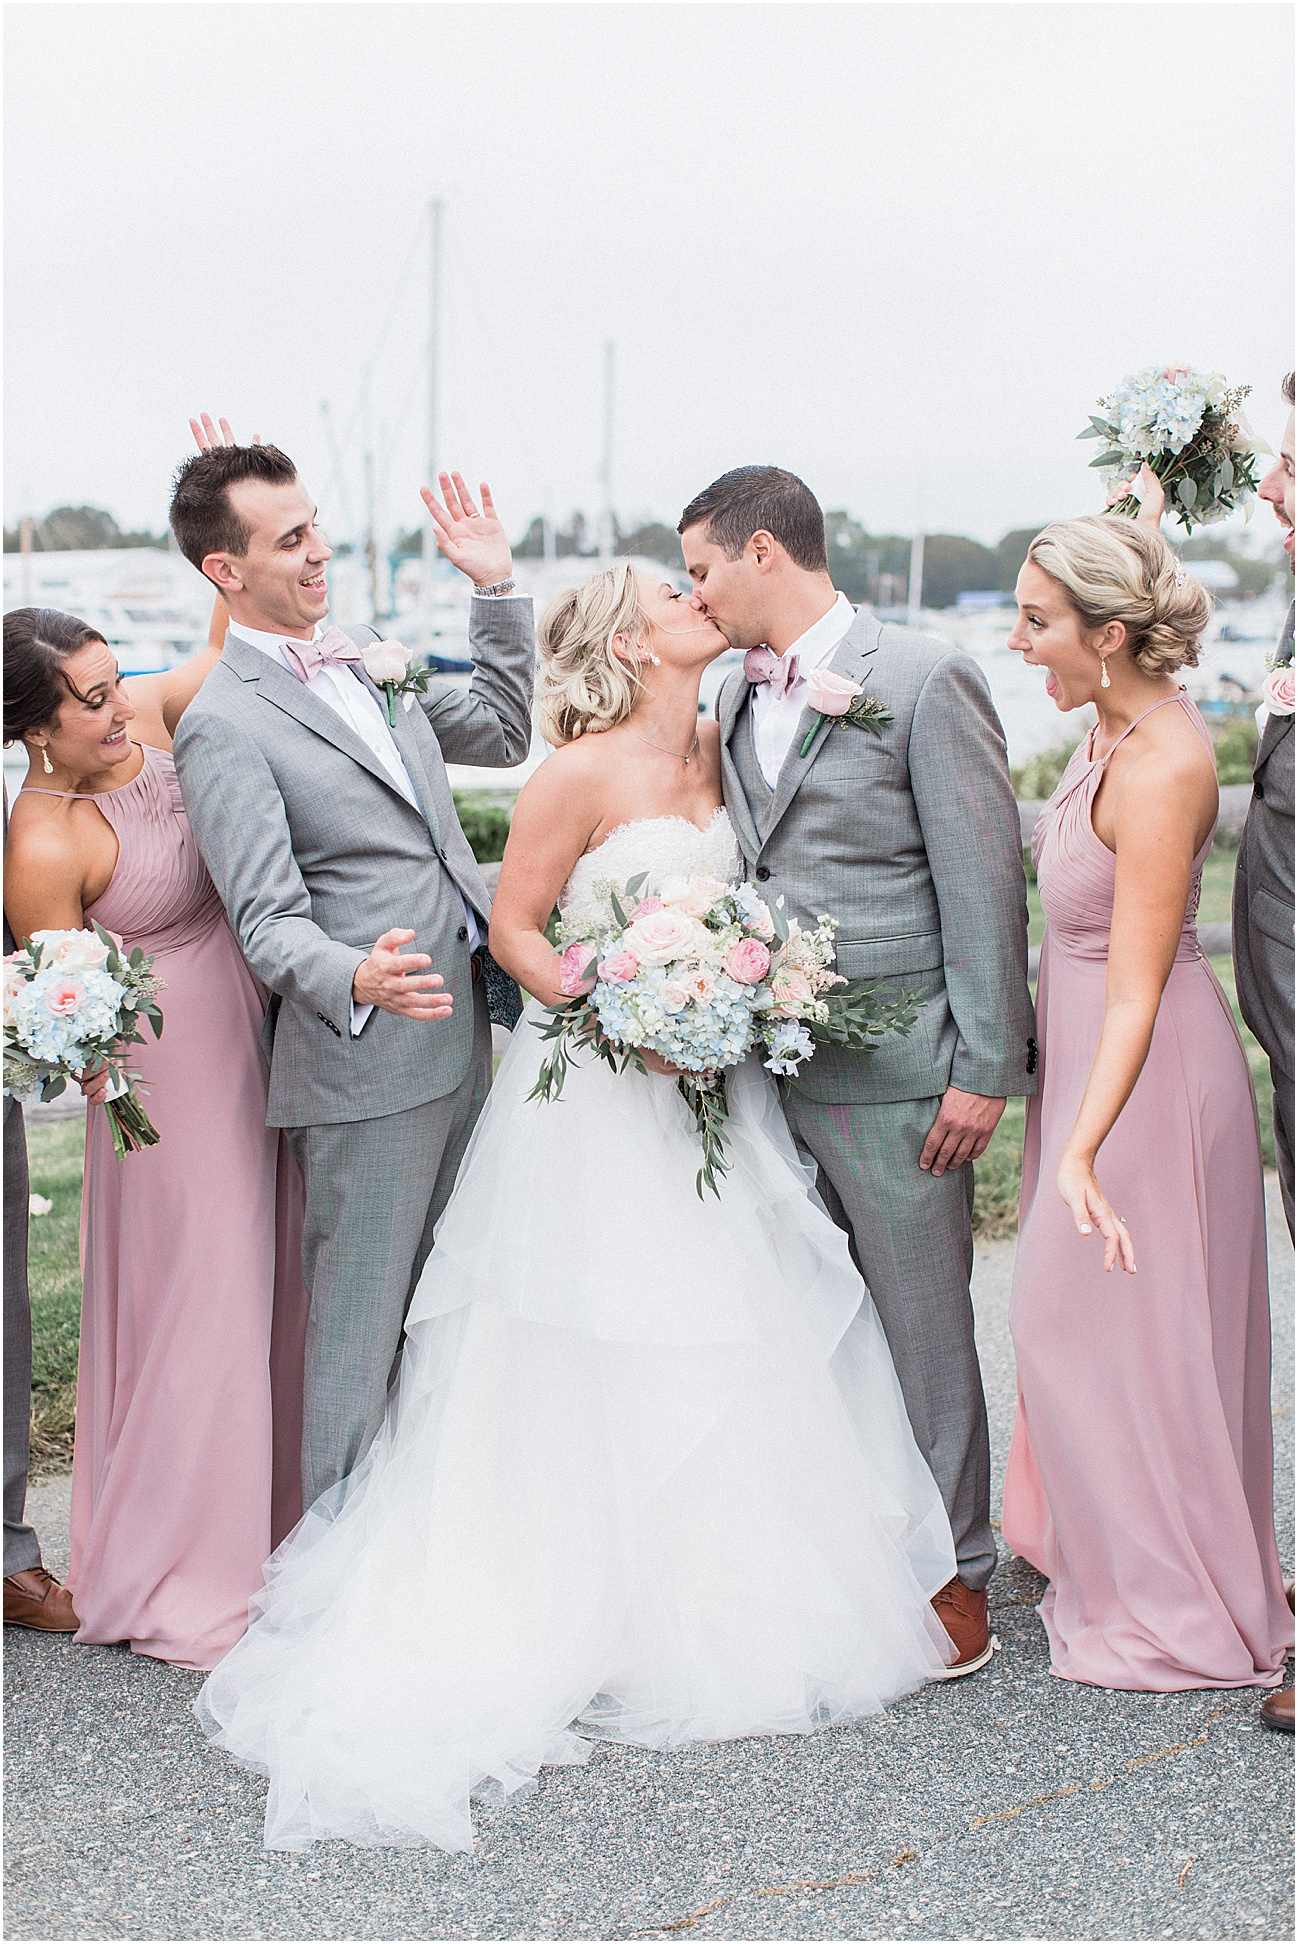 deanna_tyler_popponesset_inn_nautical_dusty_rose_pink_blue_french_fall_gray_bridesmaid_cape_cod_boston_wedding_photographer_meredith_jane_photography_photo_1363.jpg